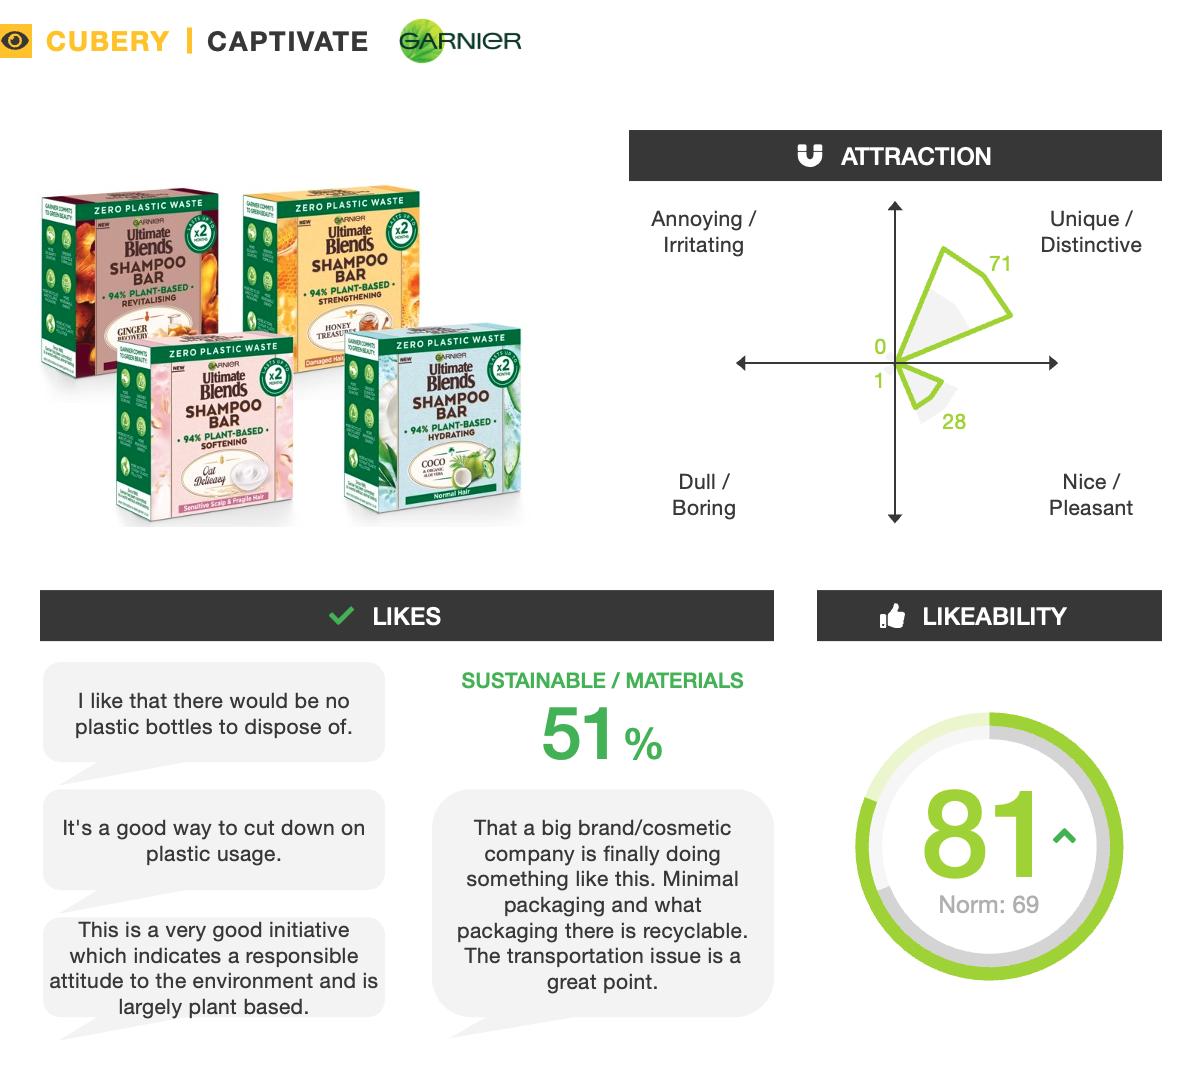 L'Oreal Garnier Eco Shampoo Bars - New Product Innovation - Captivate